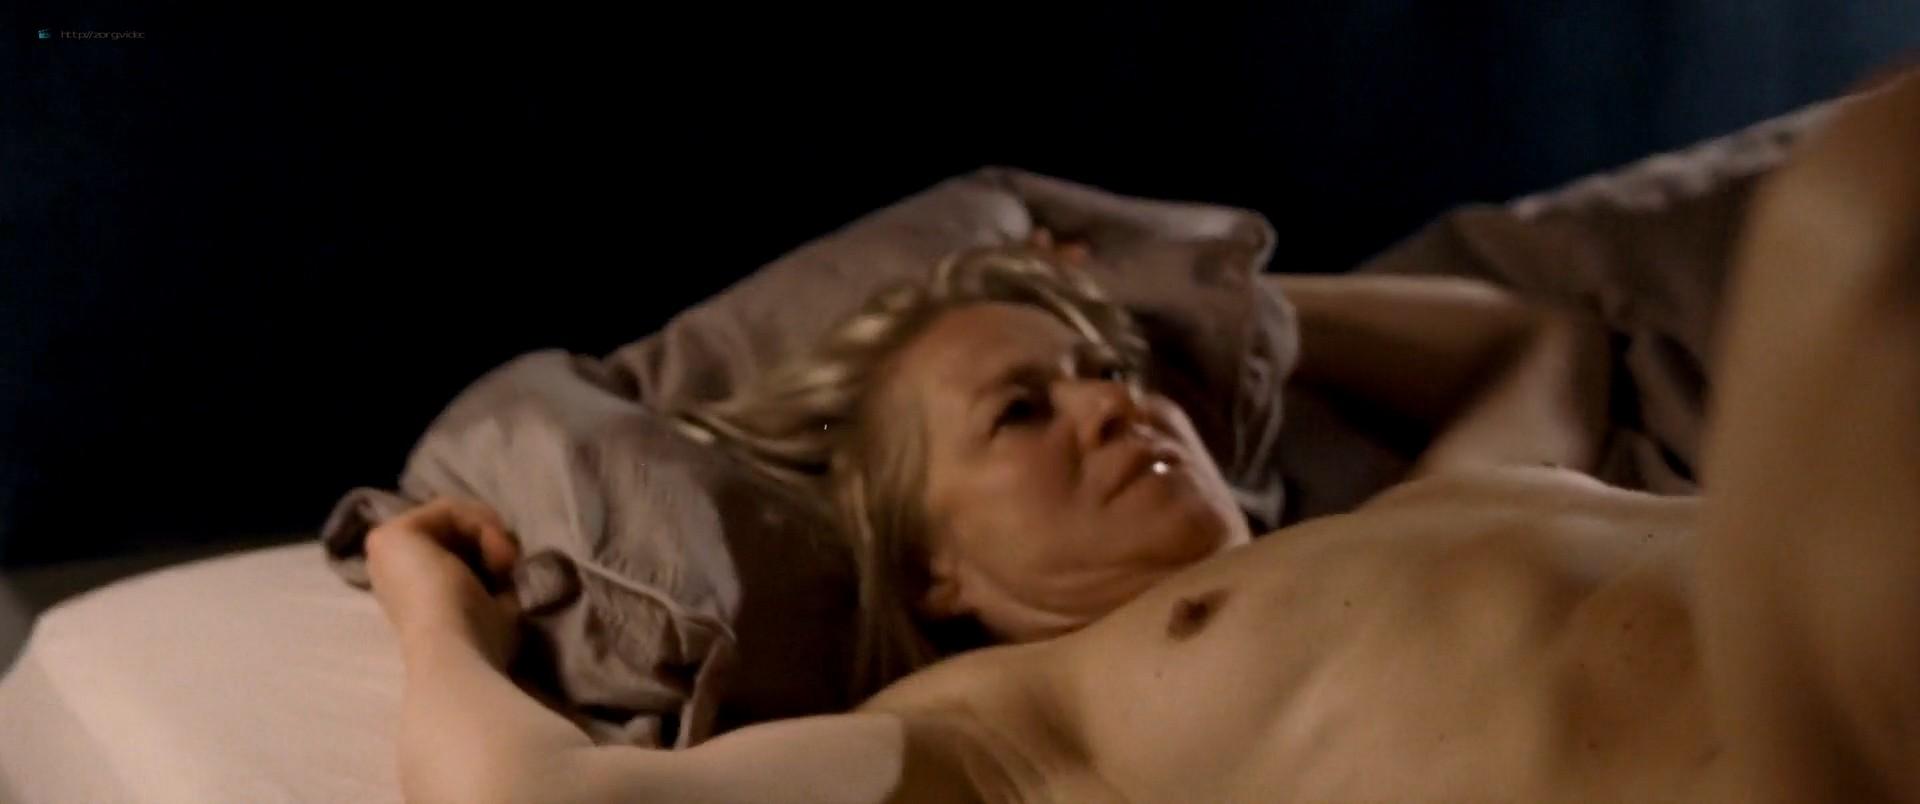 Trine Dyrholm nude explicit blow job and hot sex - Queen of Hearts (DK-2019) 1080p WEB (5)